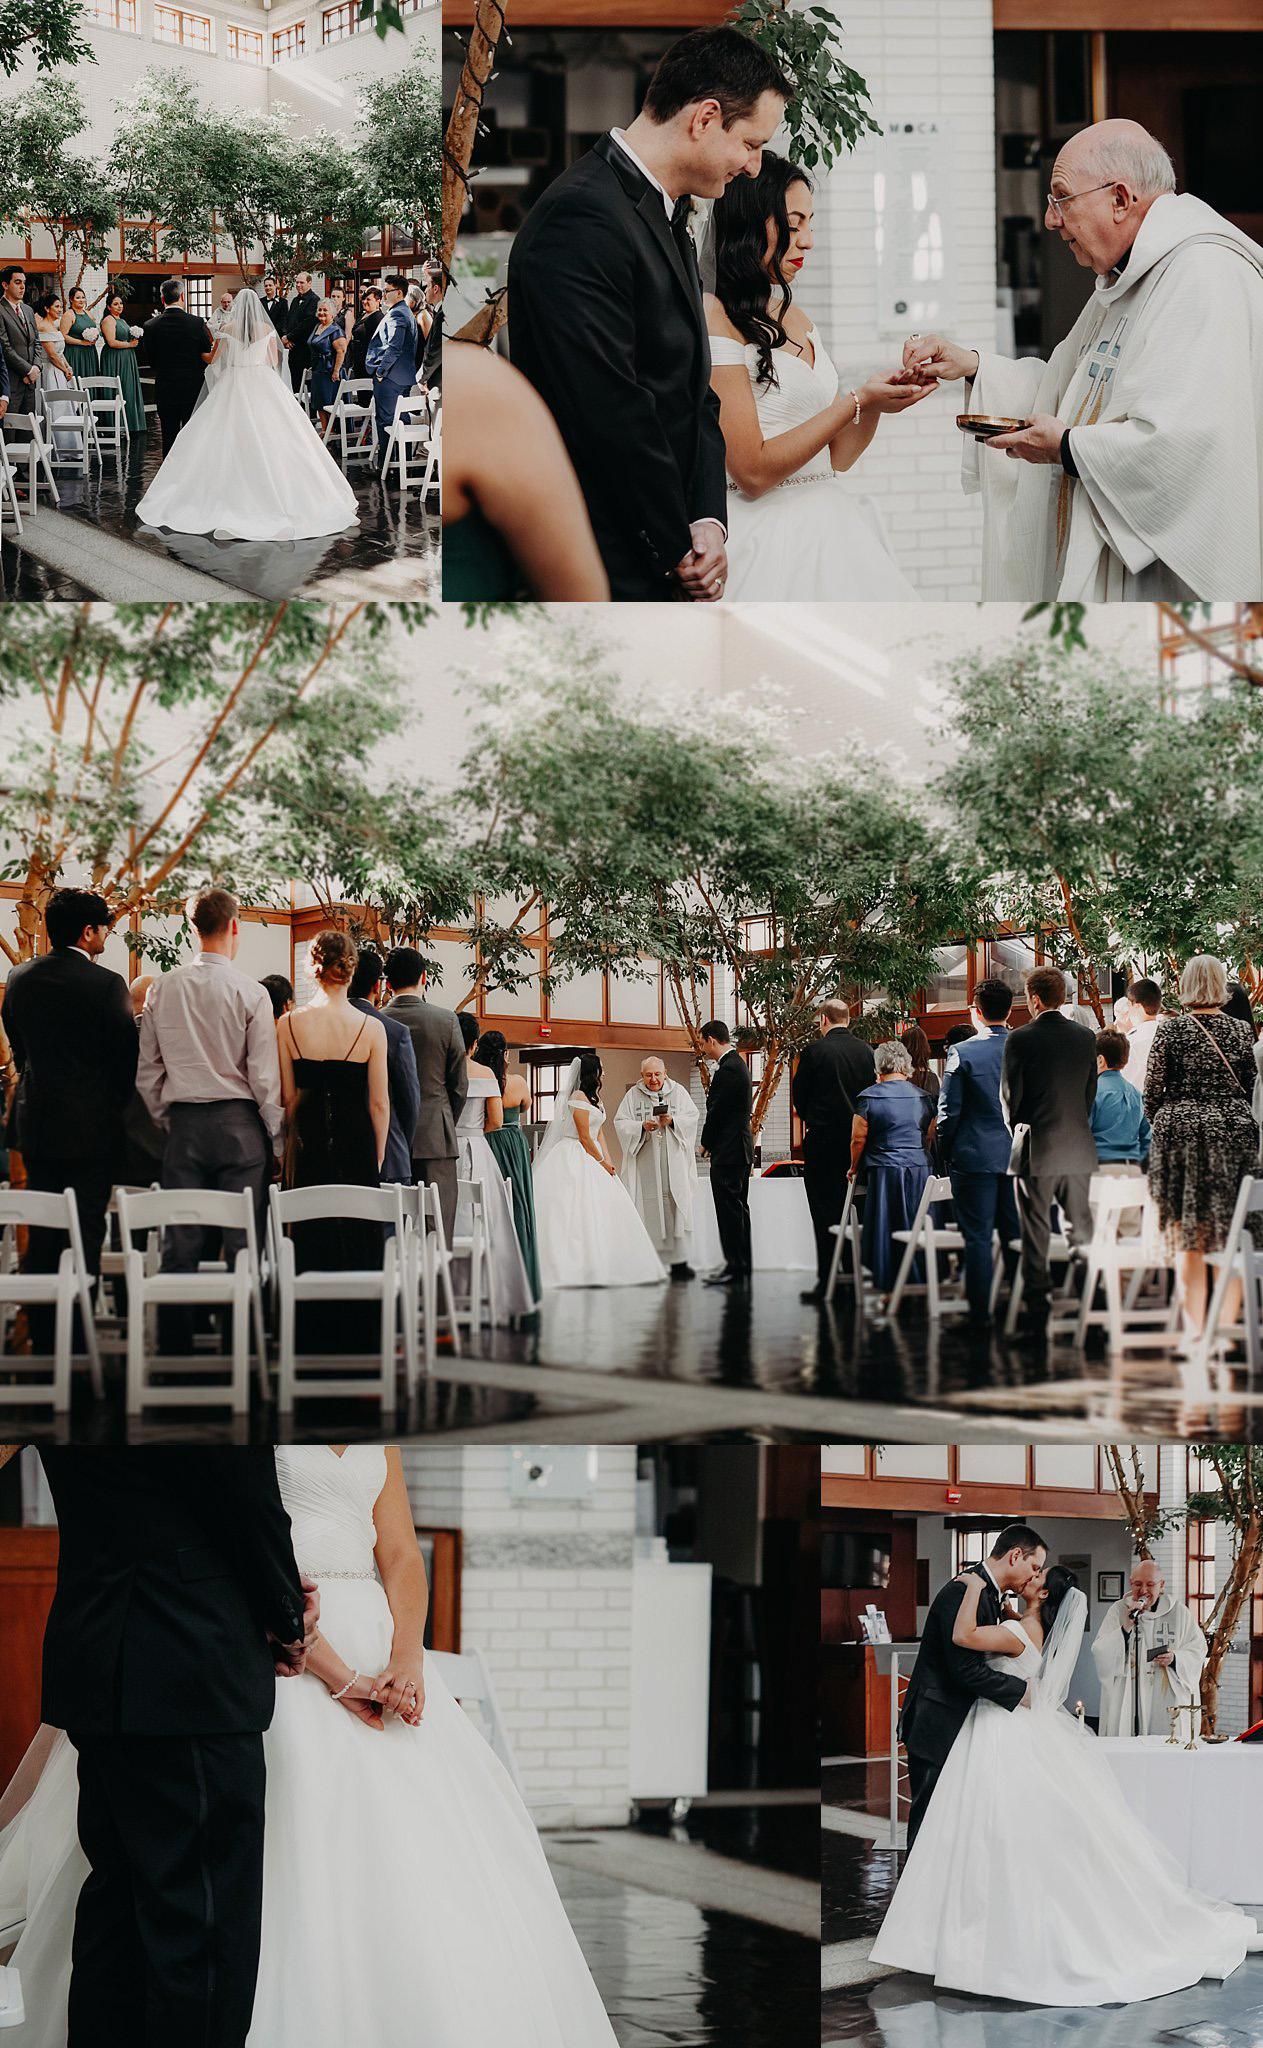 VA-wedding-venue-MOCA-virginia-beach-wedding-photography-melissa-bliss-photography-weddings-vabeach.jpg